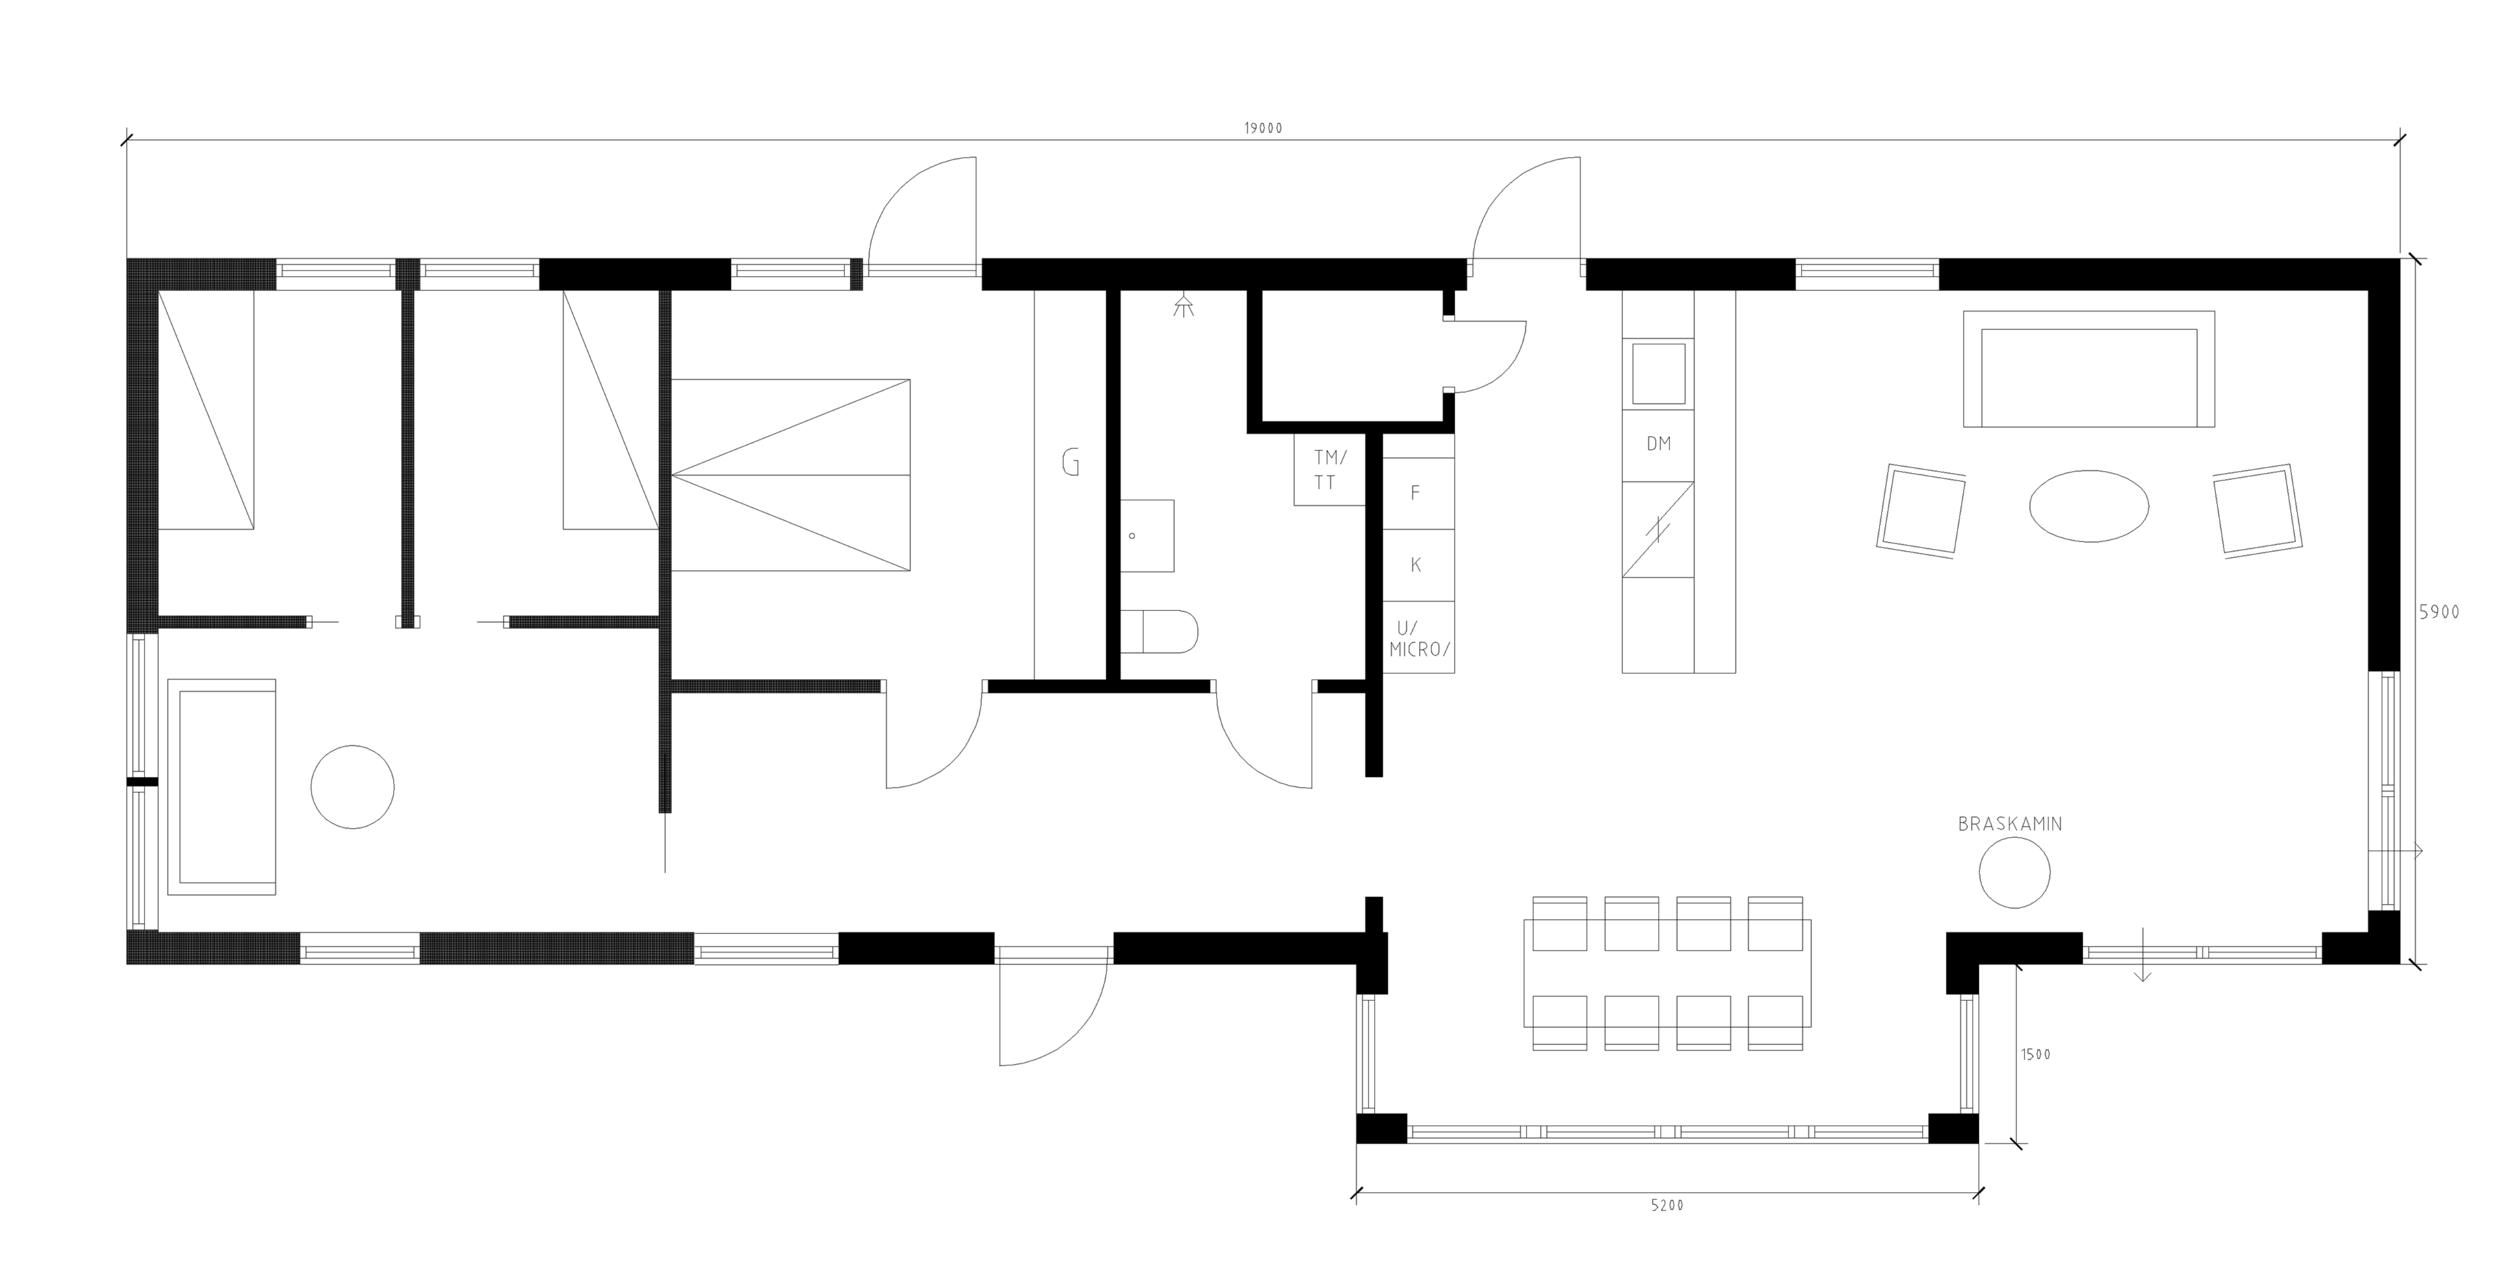 easy-house-fritidshus-120-planlösning.png